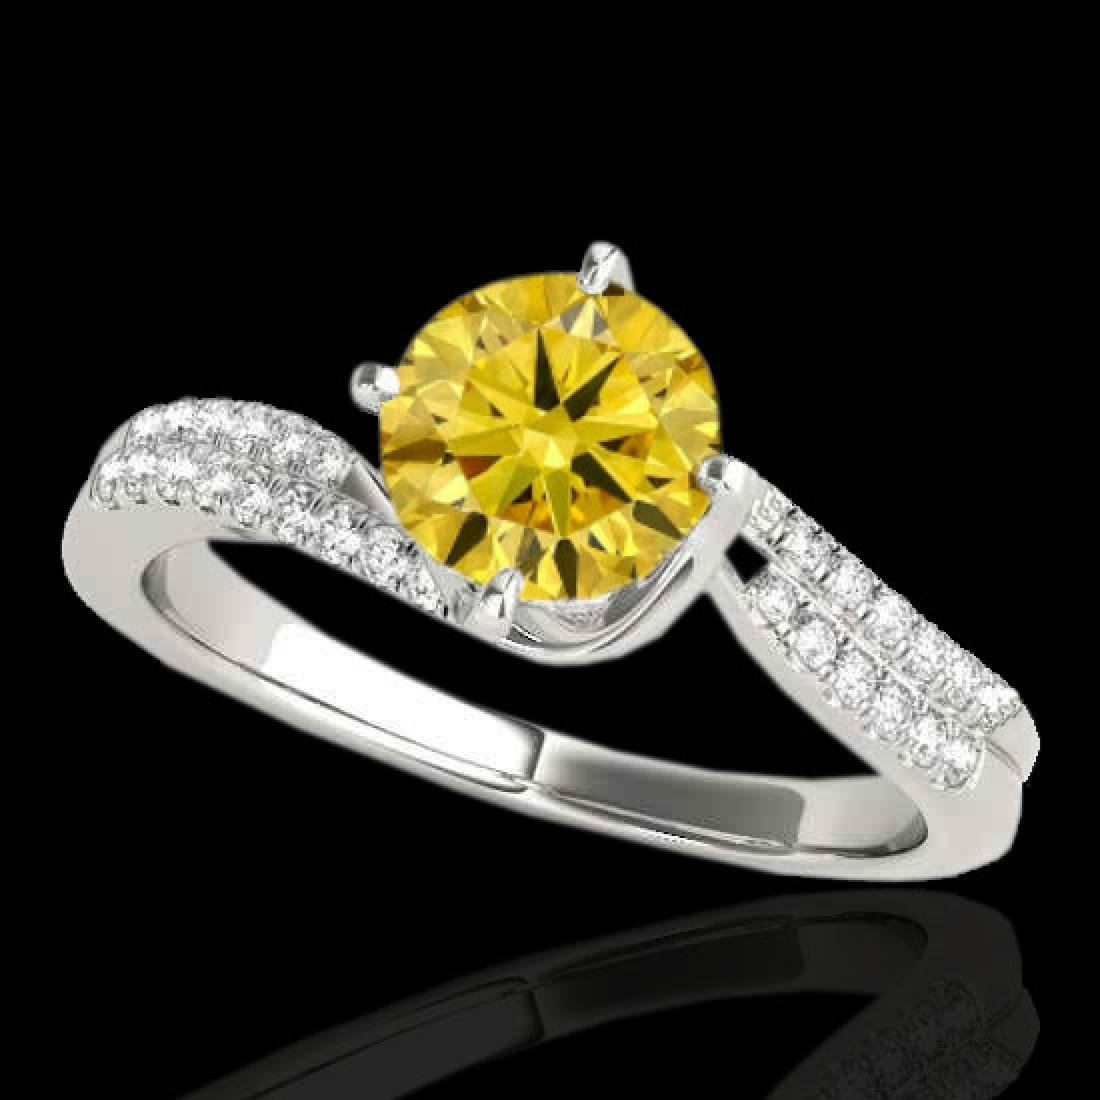 1.2 CTW Certified Si Fancy Yellow Diamond Bypass